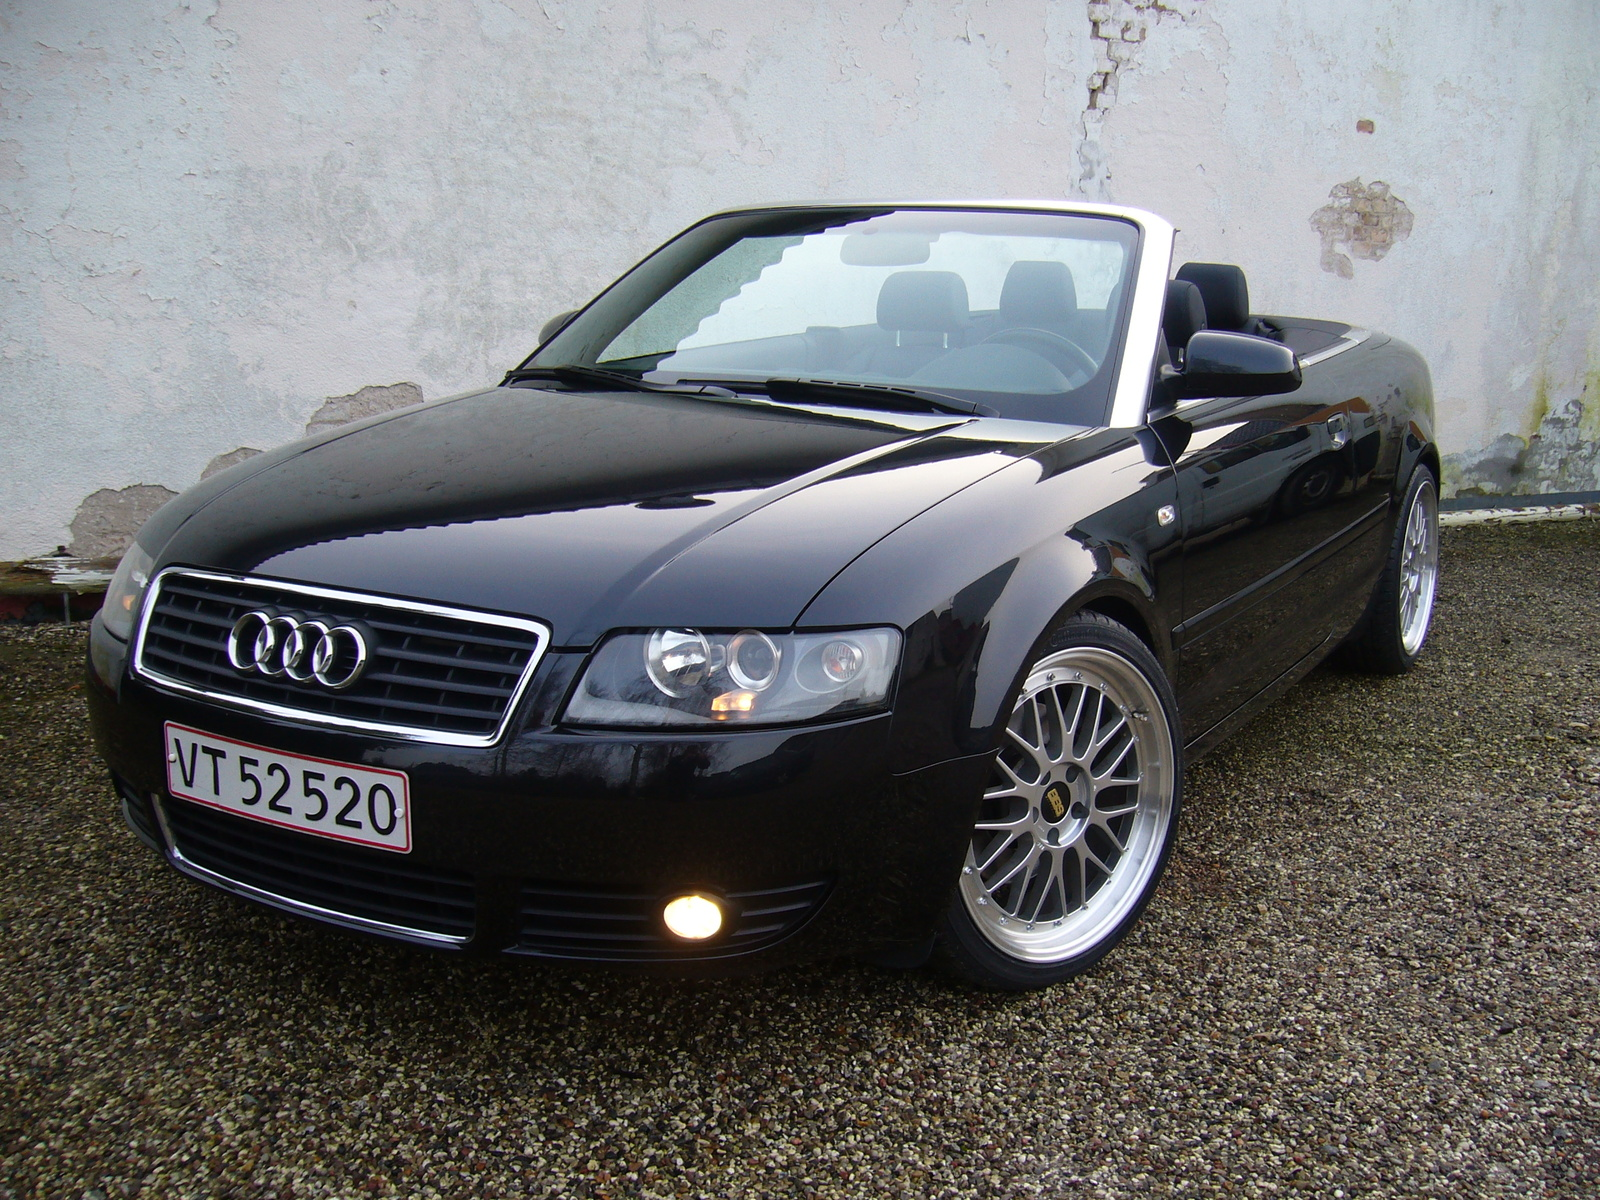 2004 Audi A4 - Overview - CarGurus